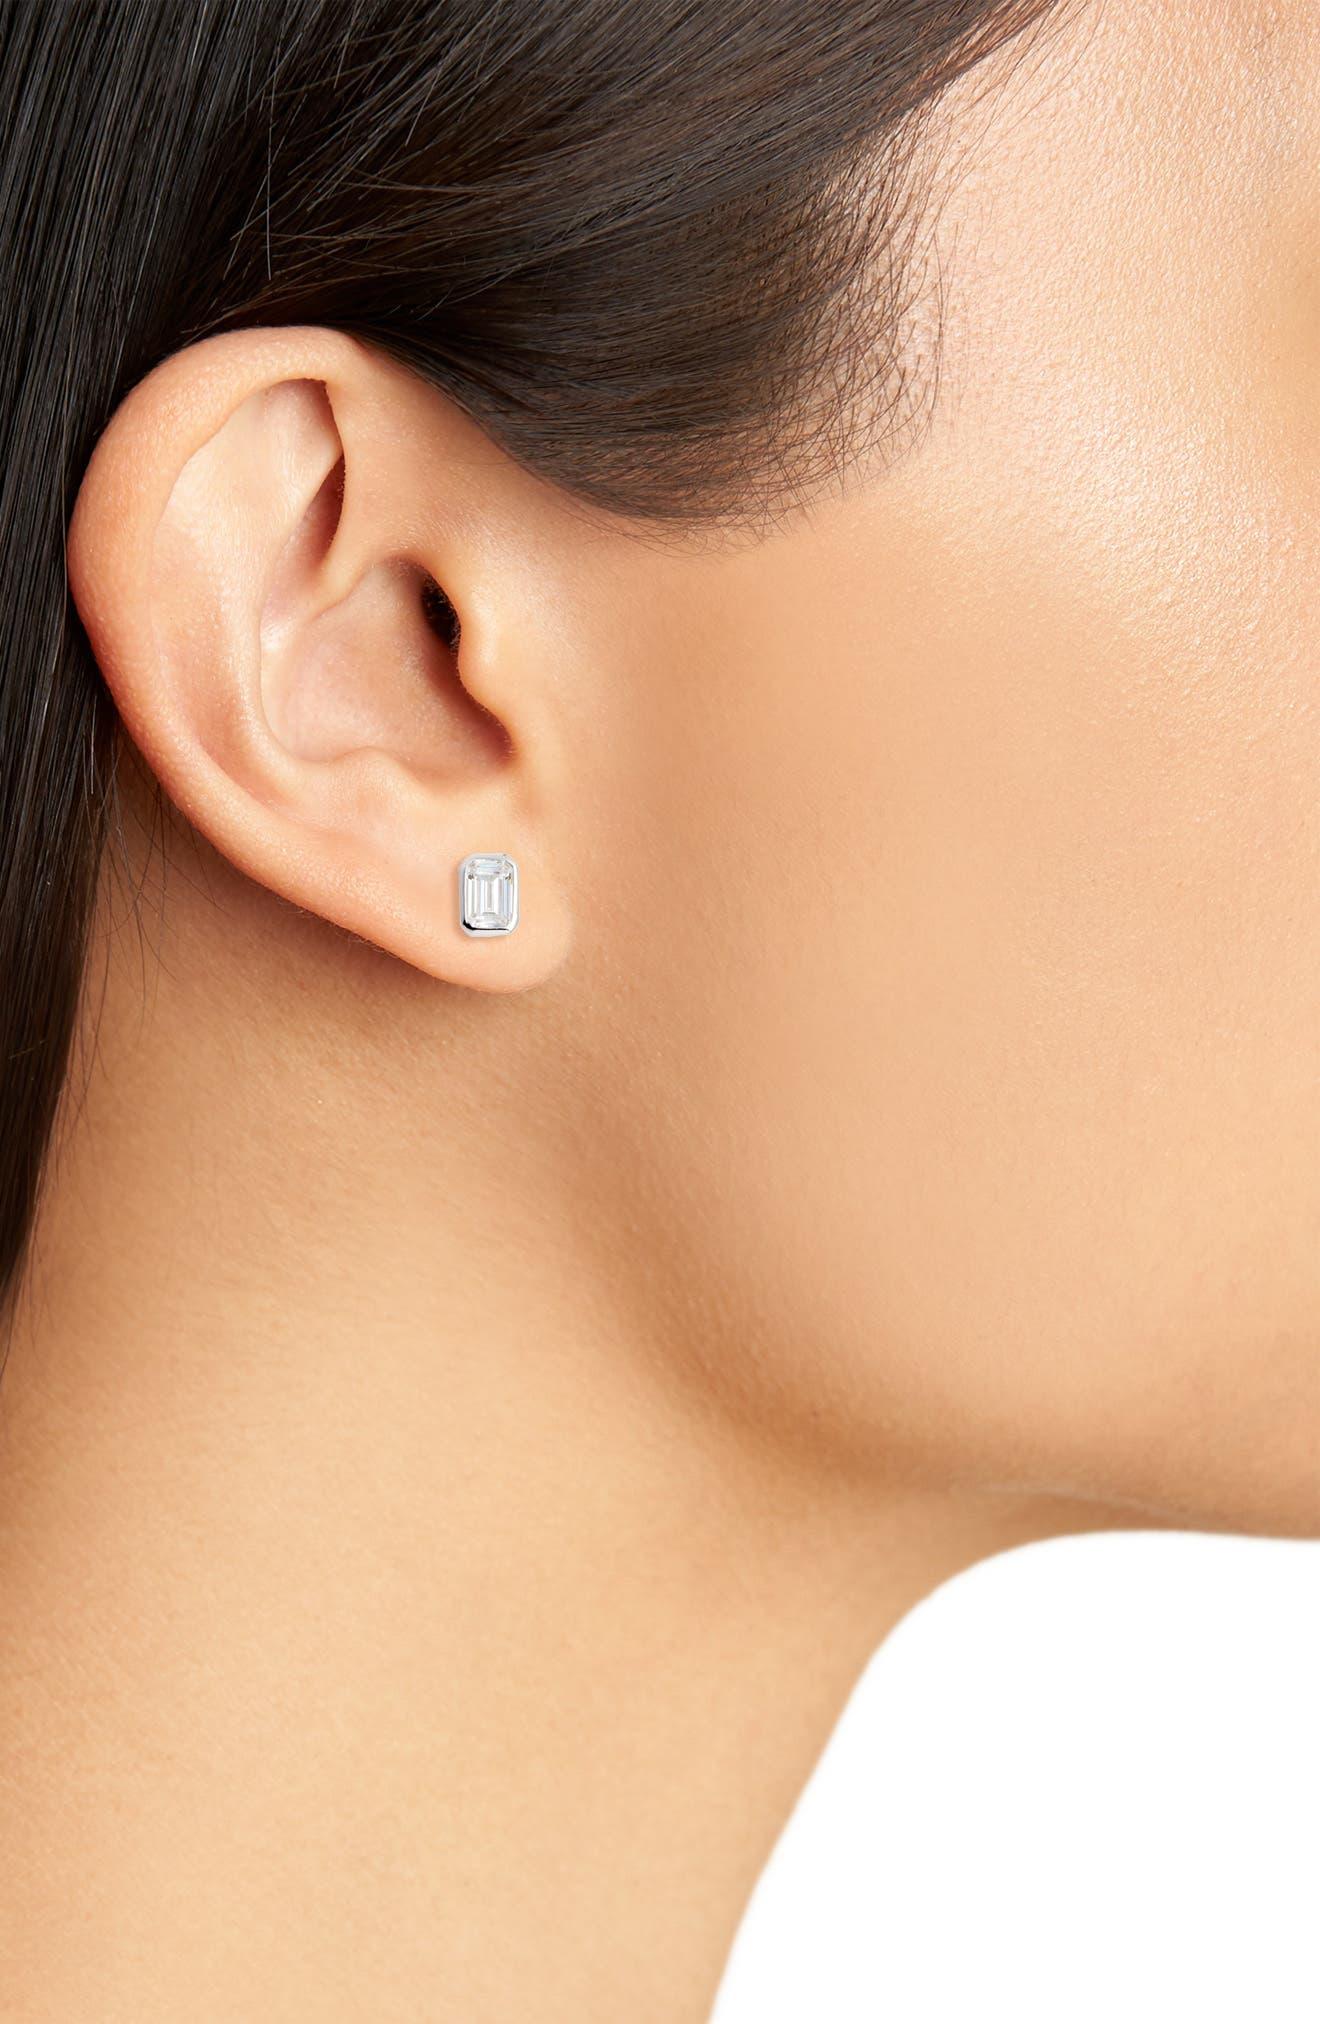 Bezel-Set Emerald Cut Stud Earrings,                             Alternate thumbnail 2, color,                             Silver/ Clear